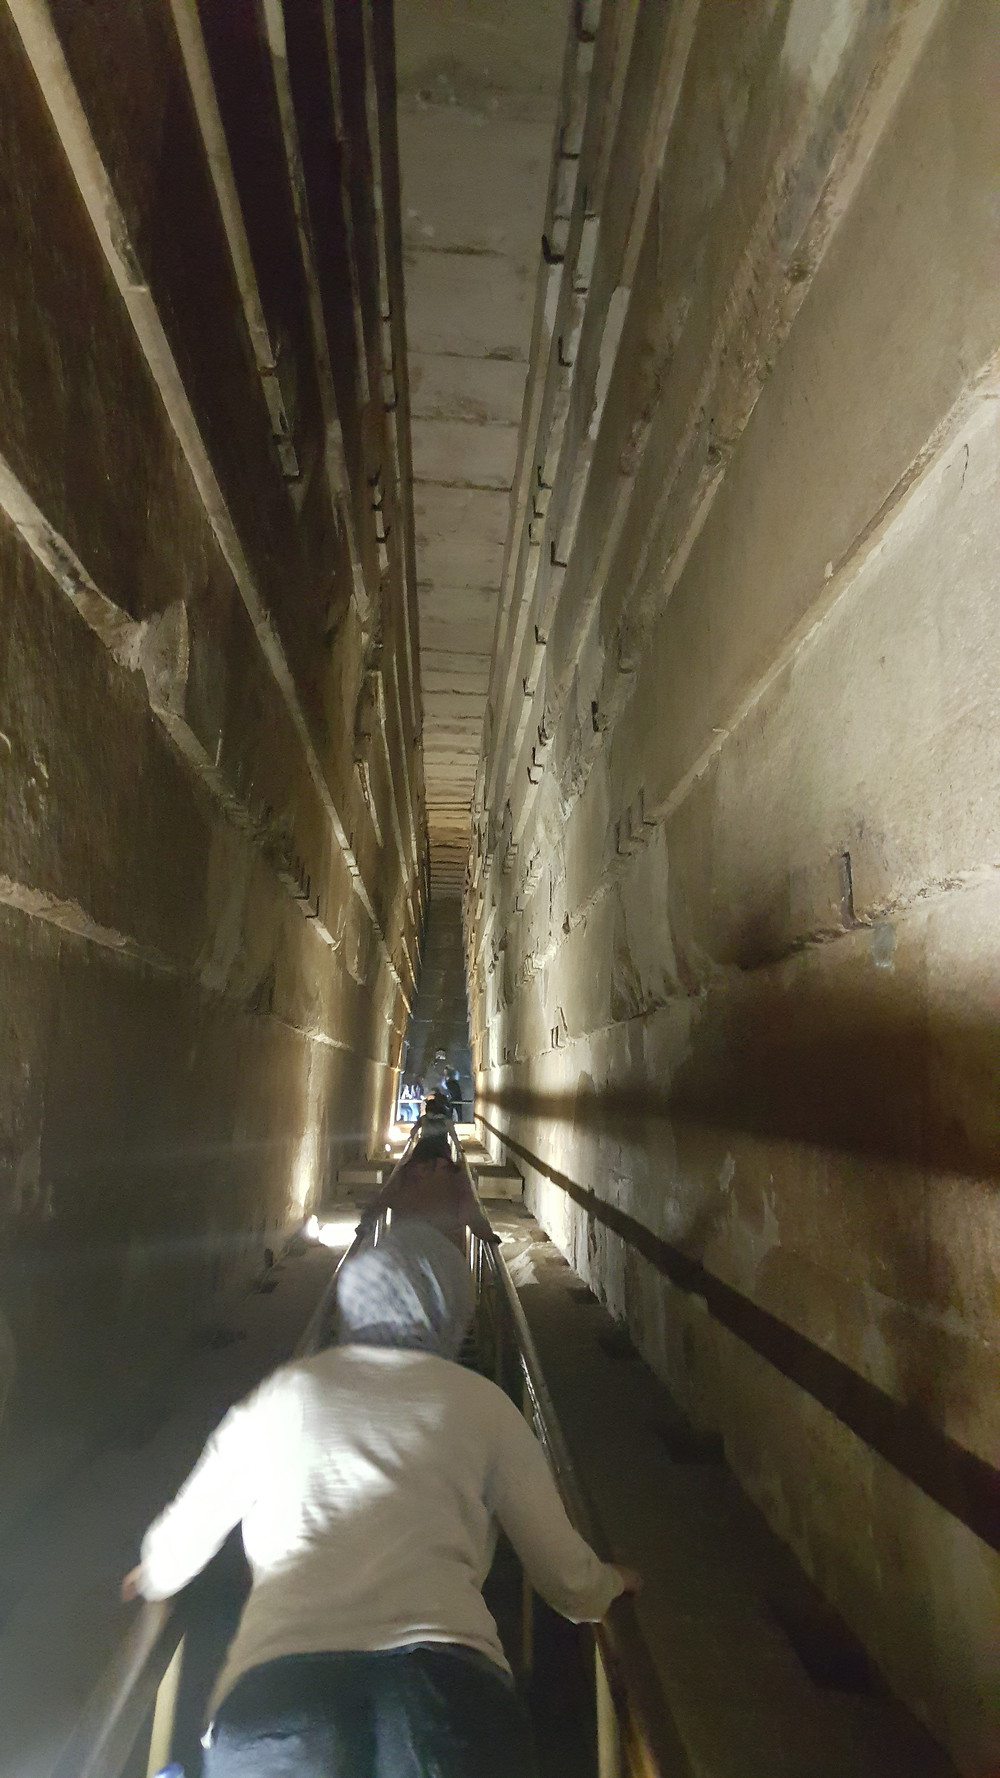 Dans la pyramide ..grnade galerie de 49 m